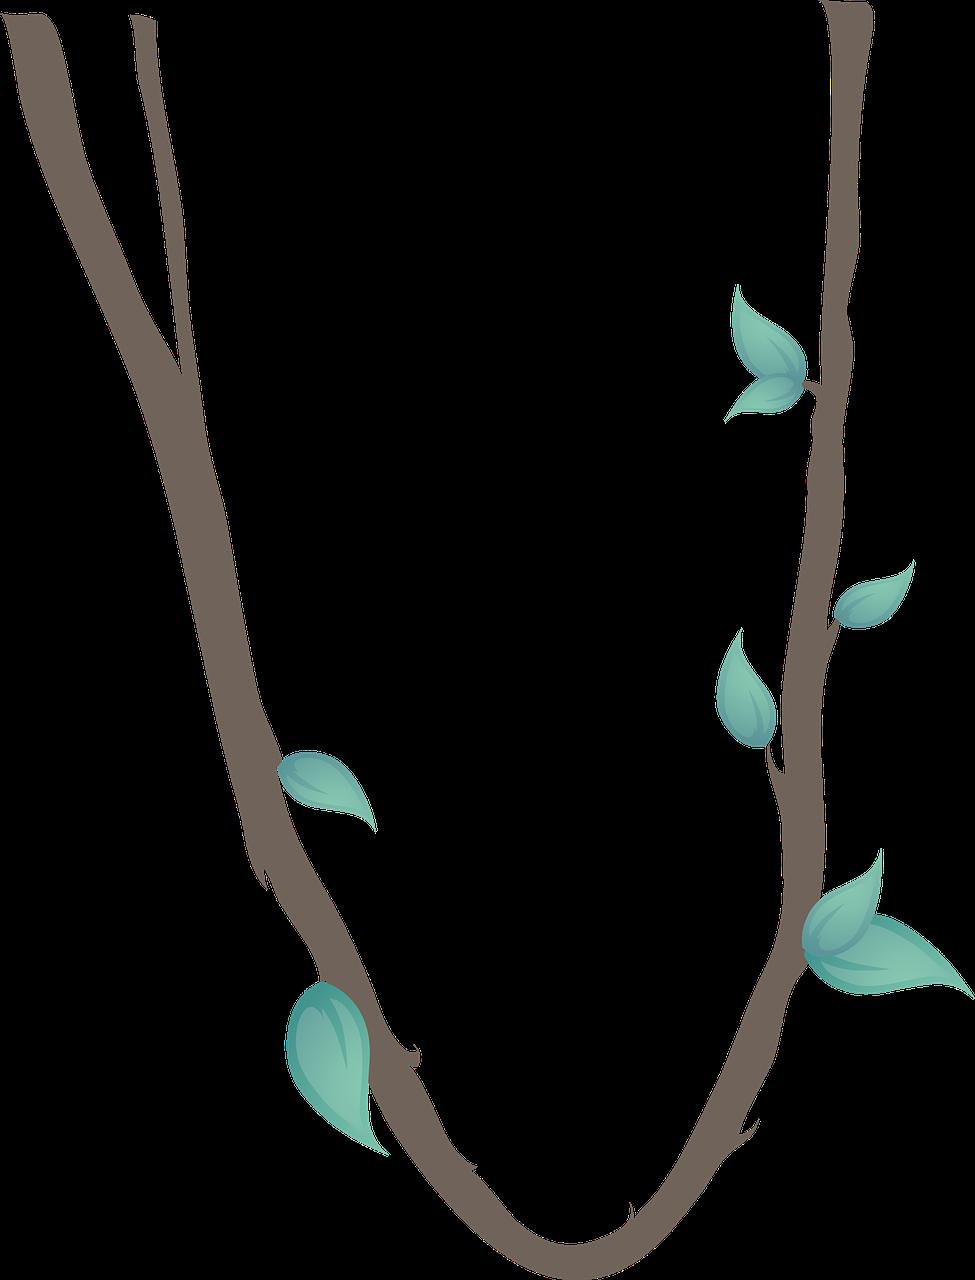 Free Jungle Vines Png, Download Free Clip Art, Free Clip Art.